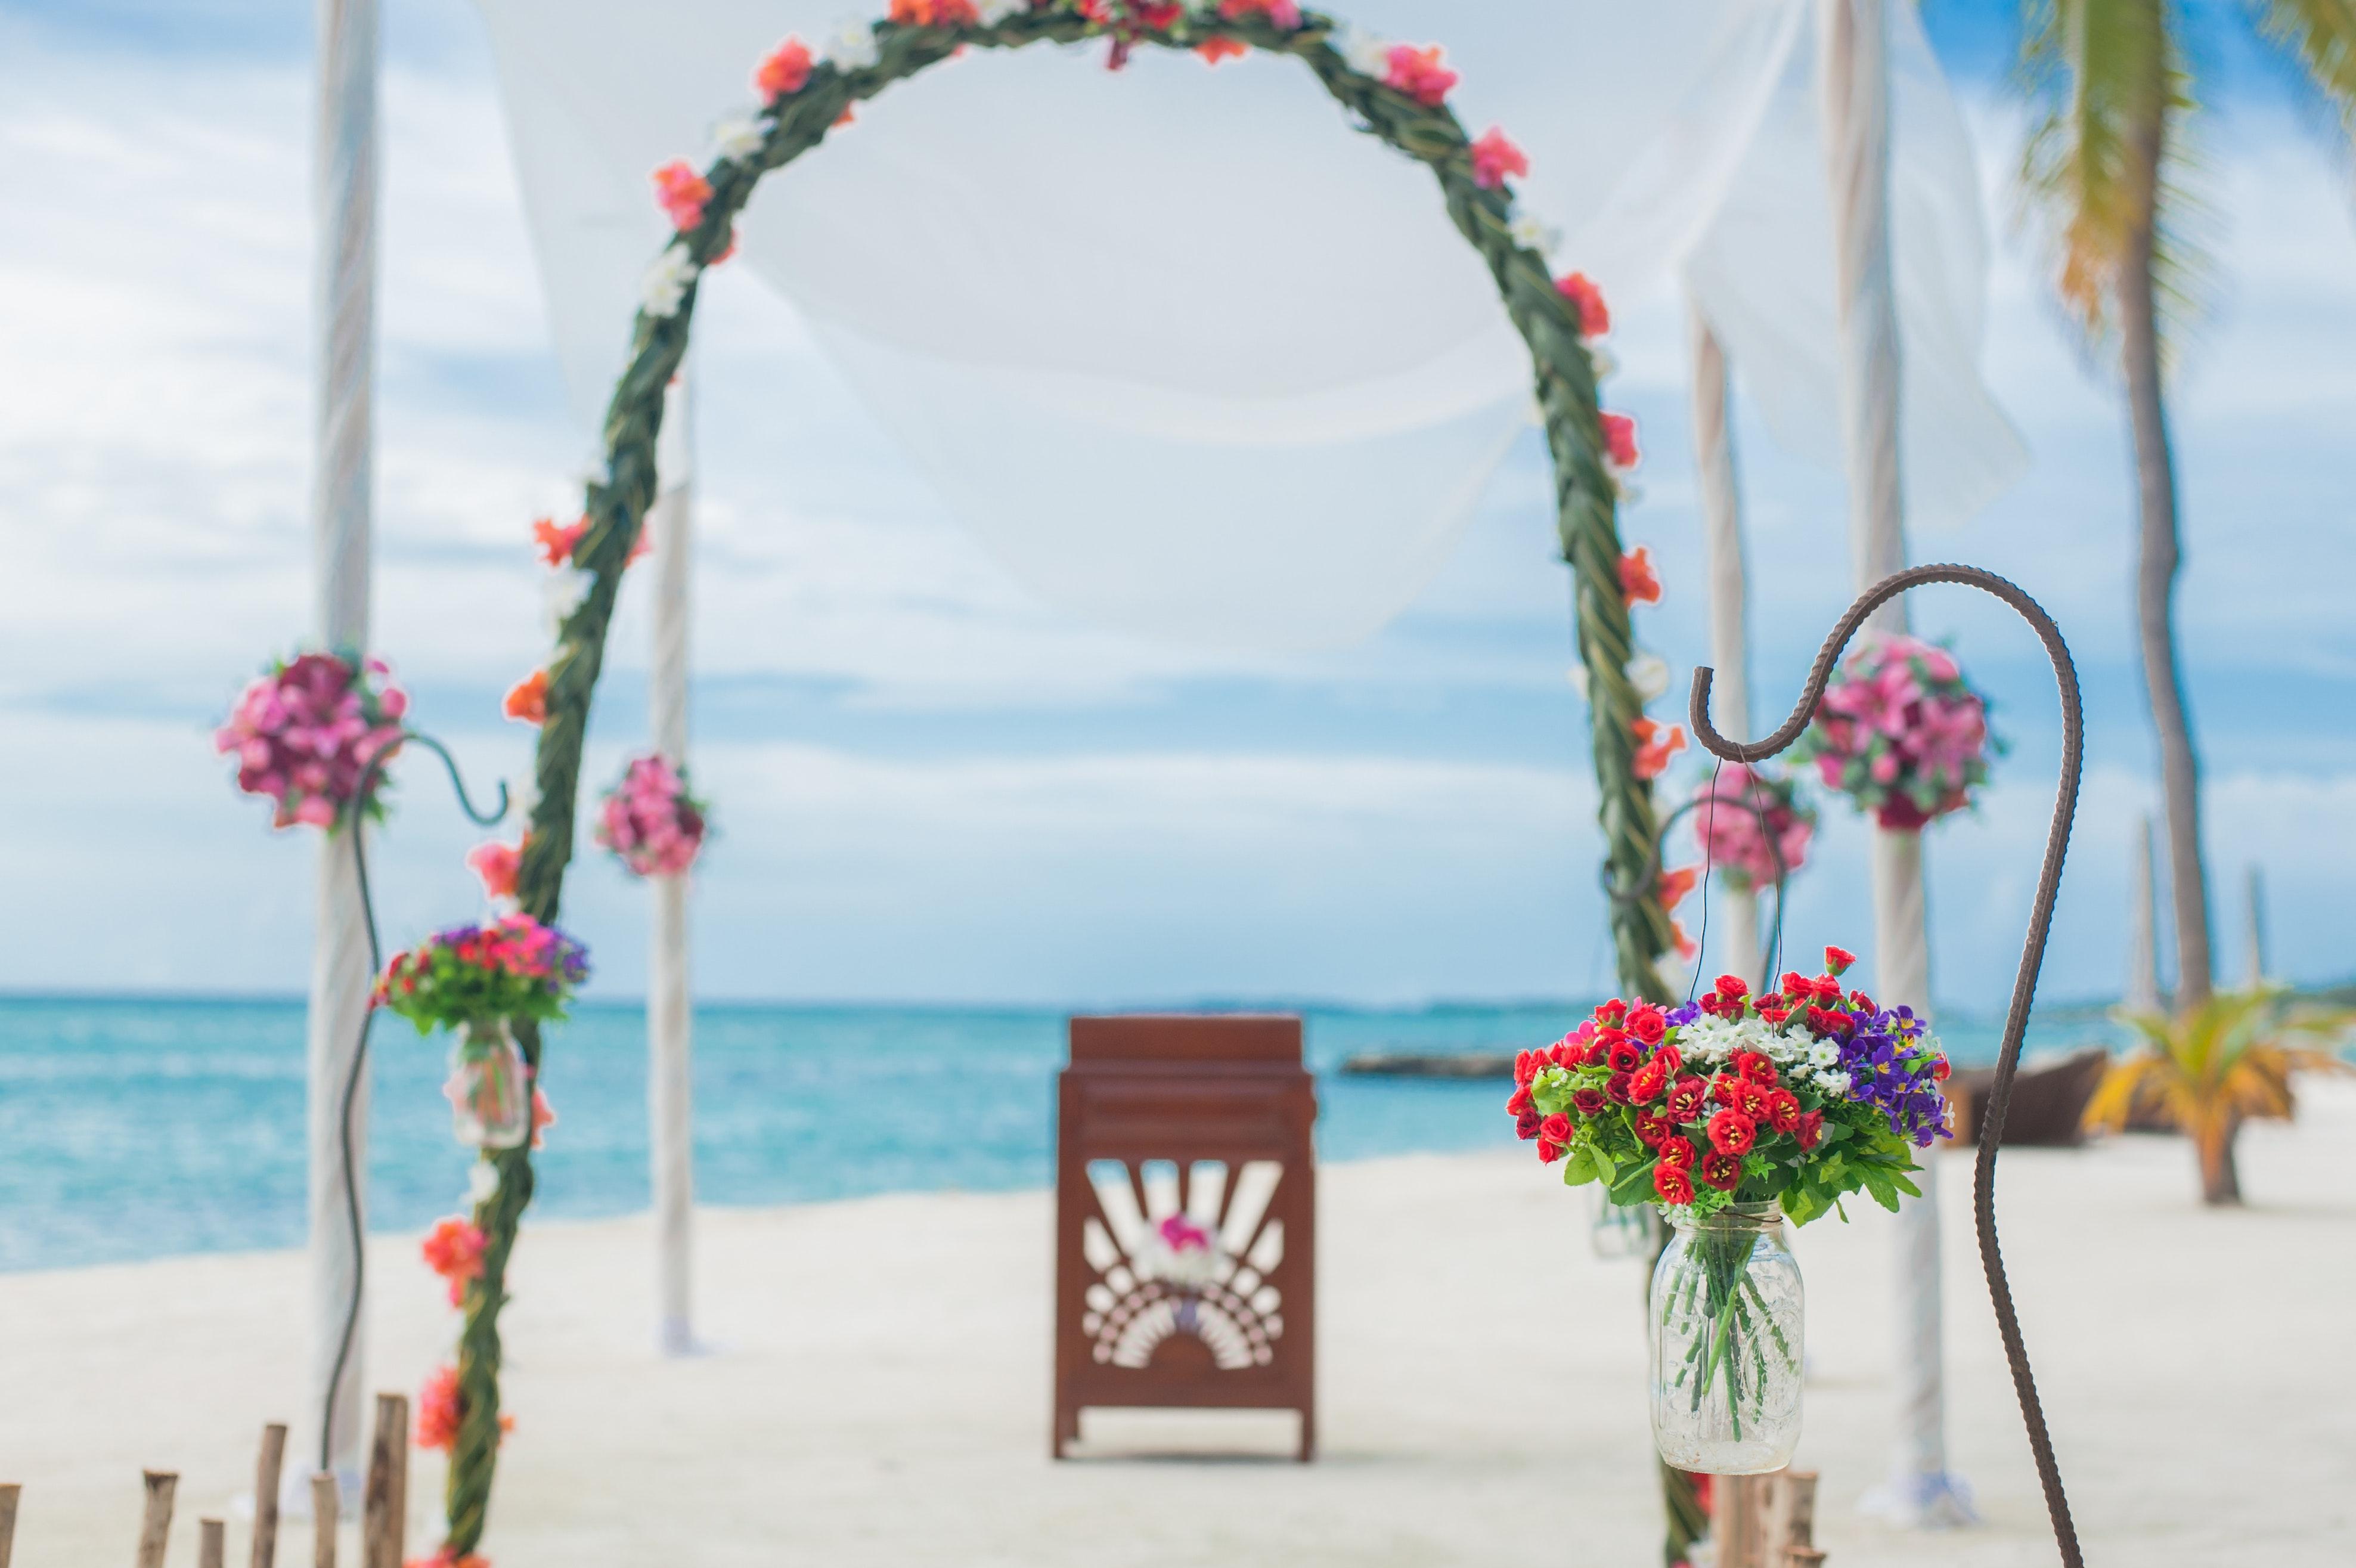 beach-beach-wedding-daylight-1654827jpg